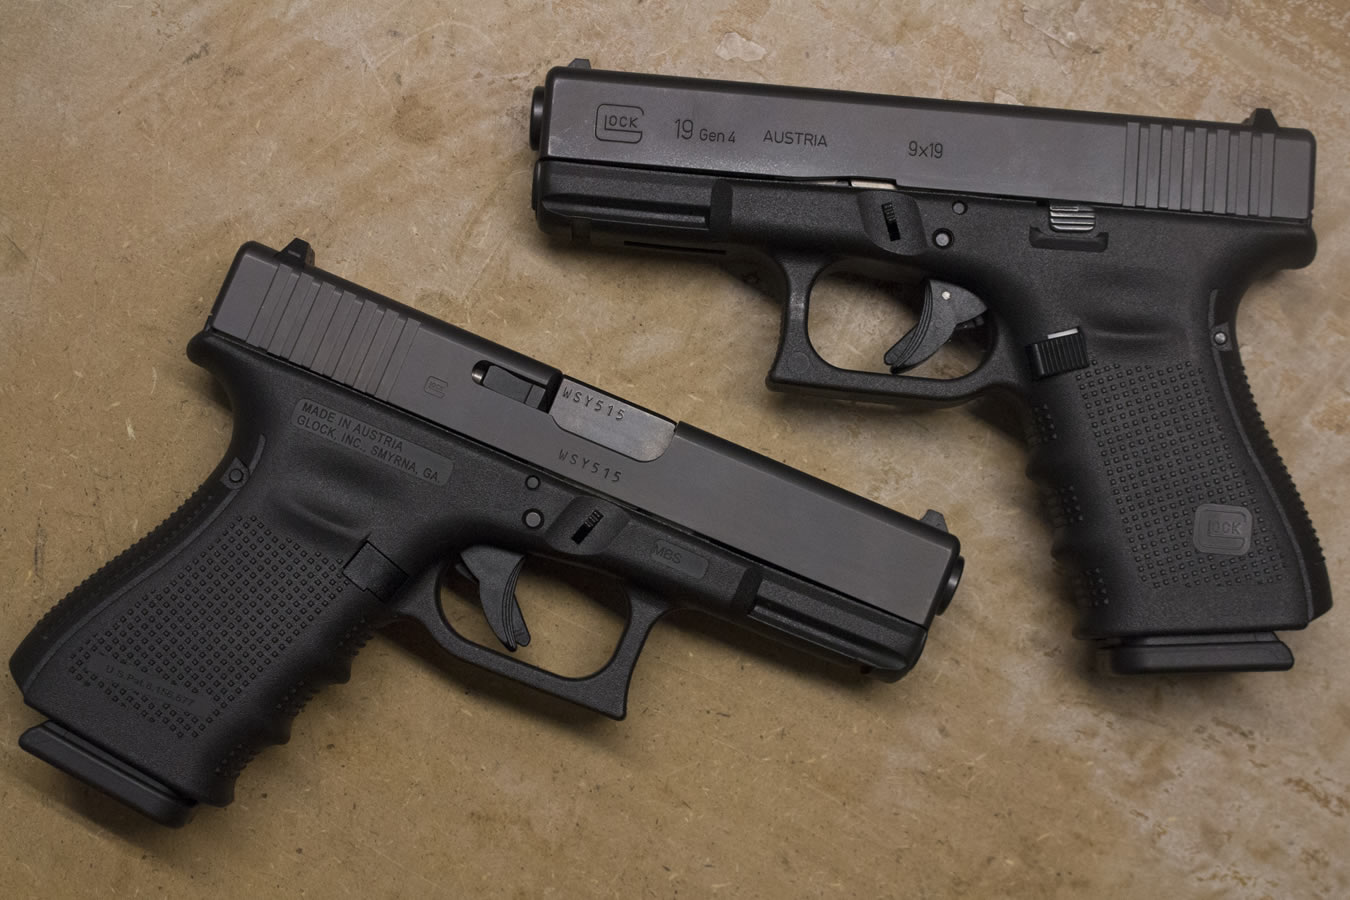 glock 19 gen4 9mm police trade ins very good condition